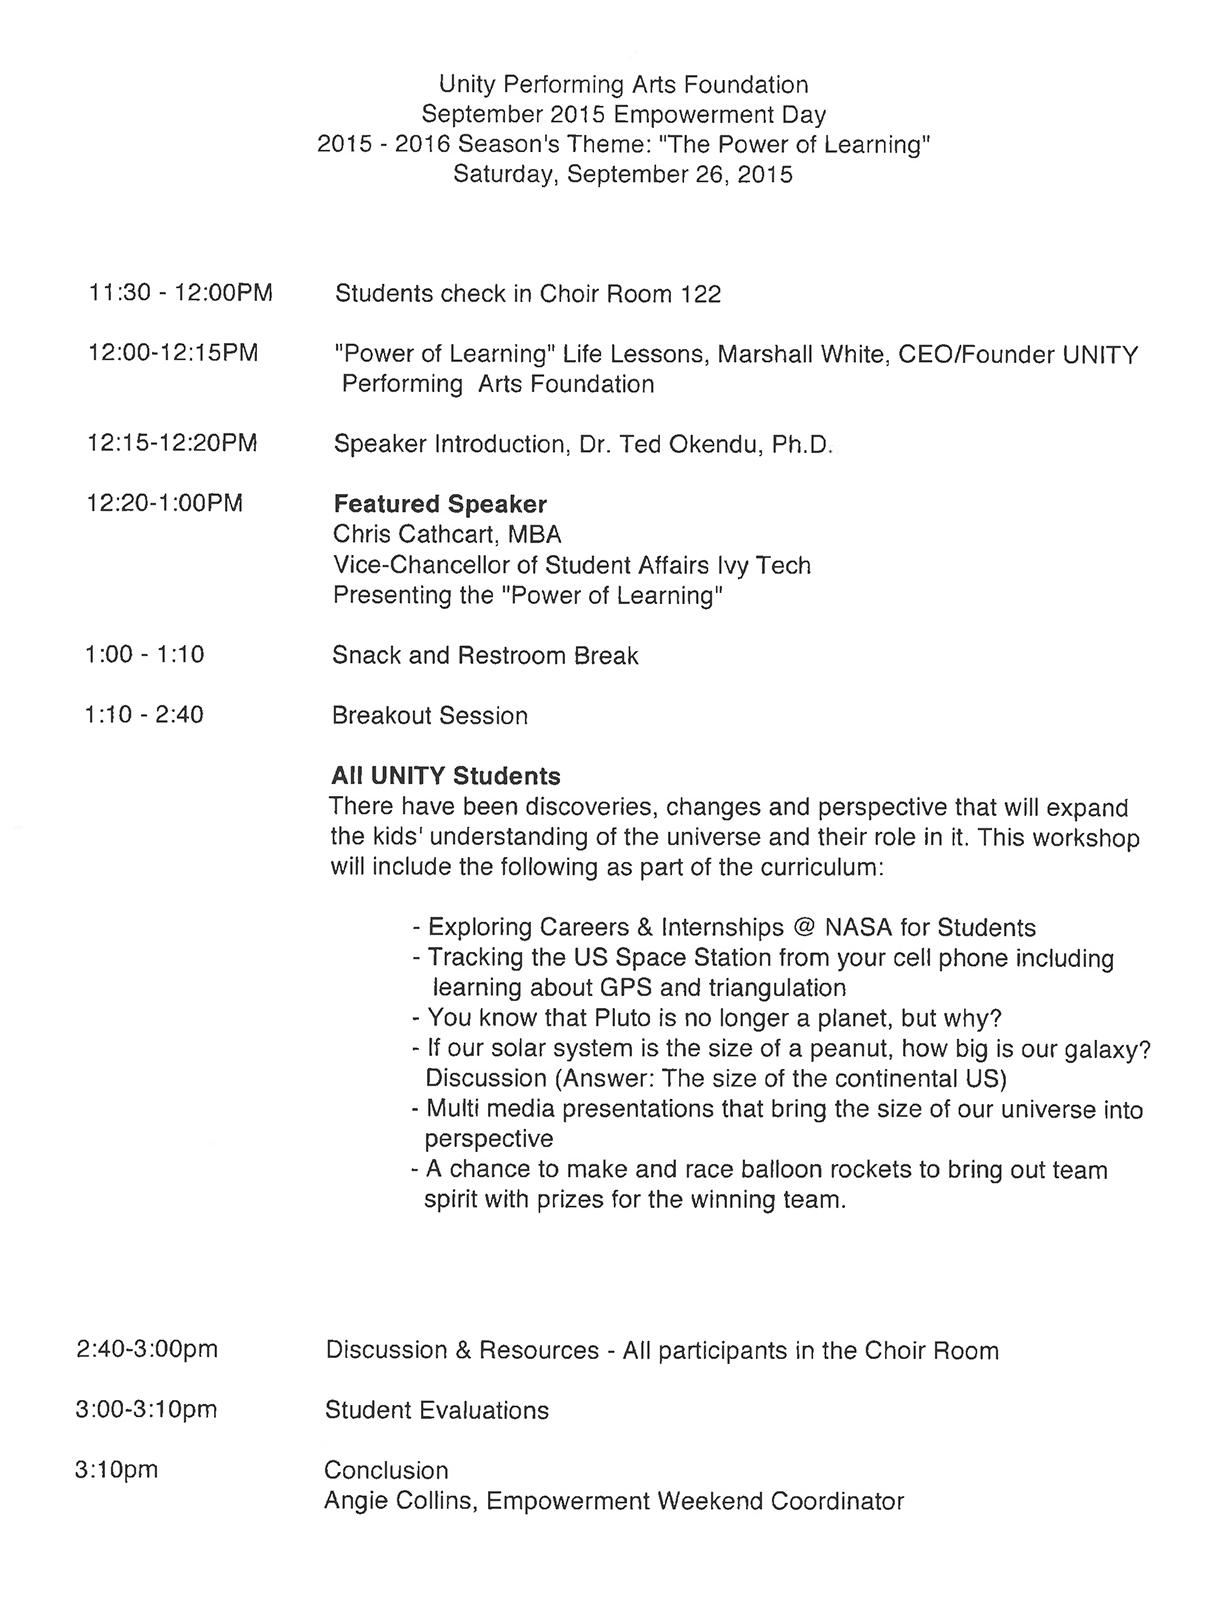 Empowerment Schedule